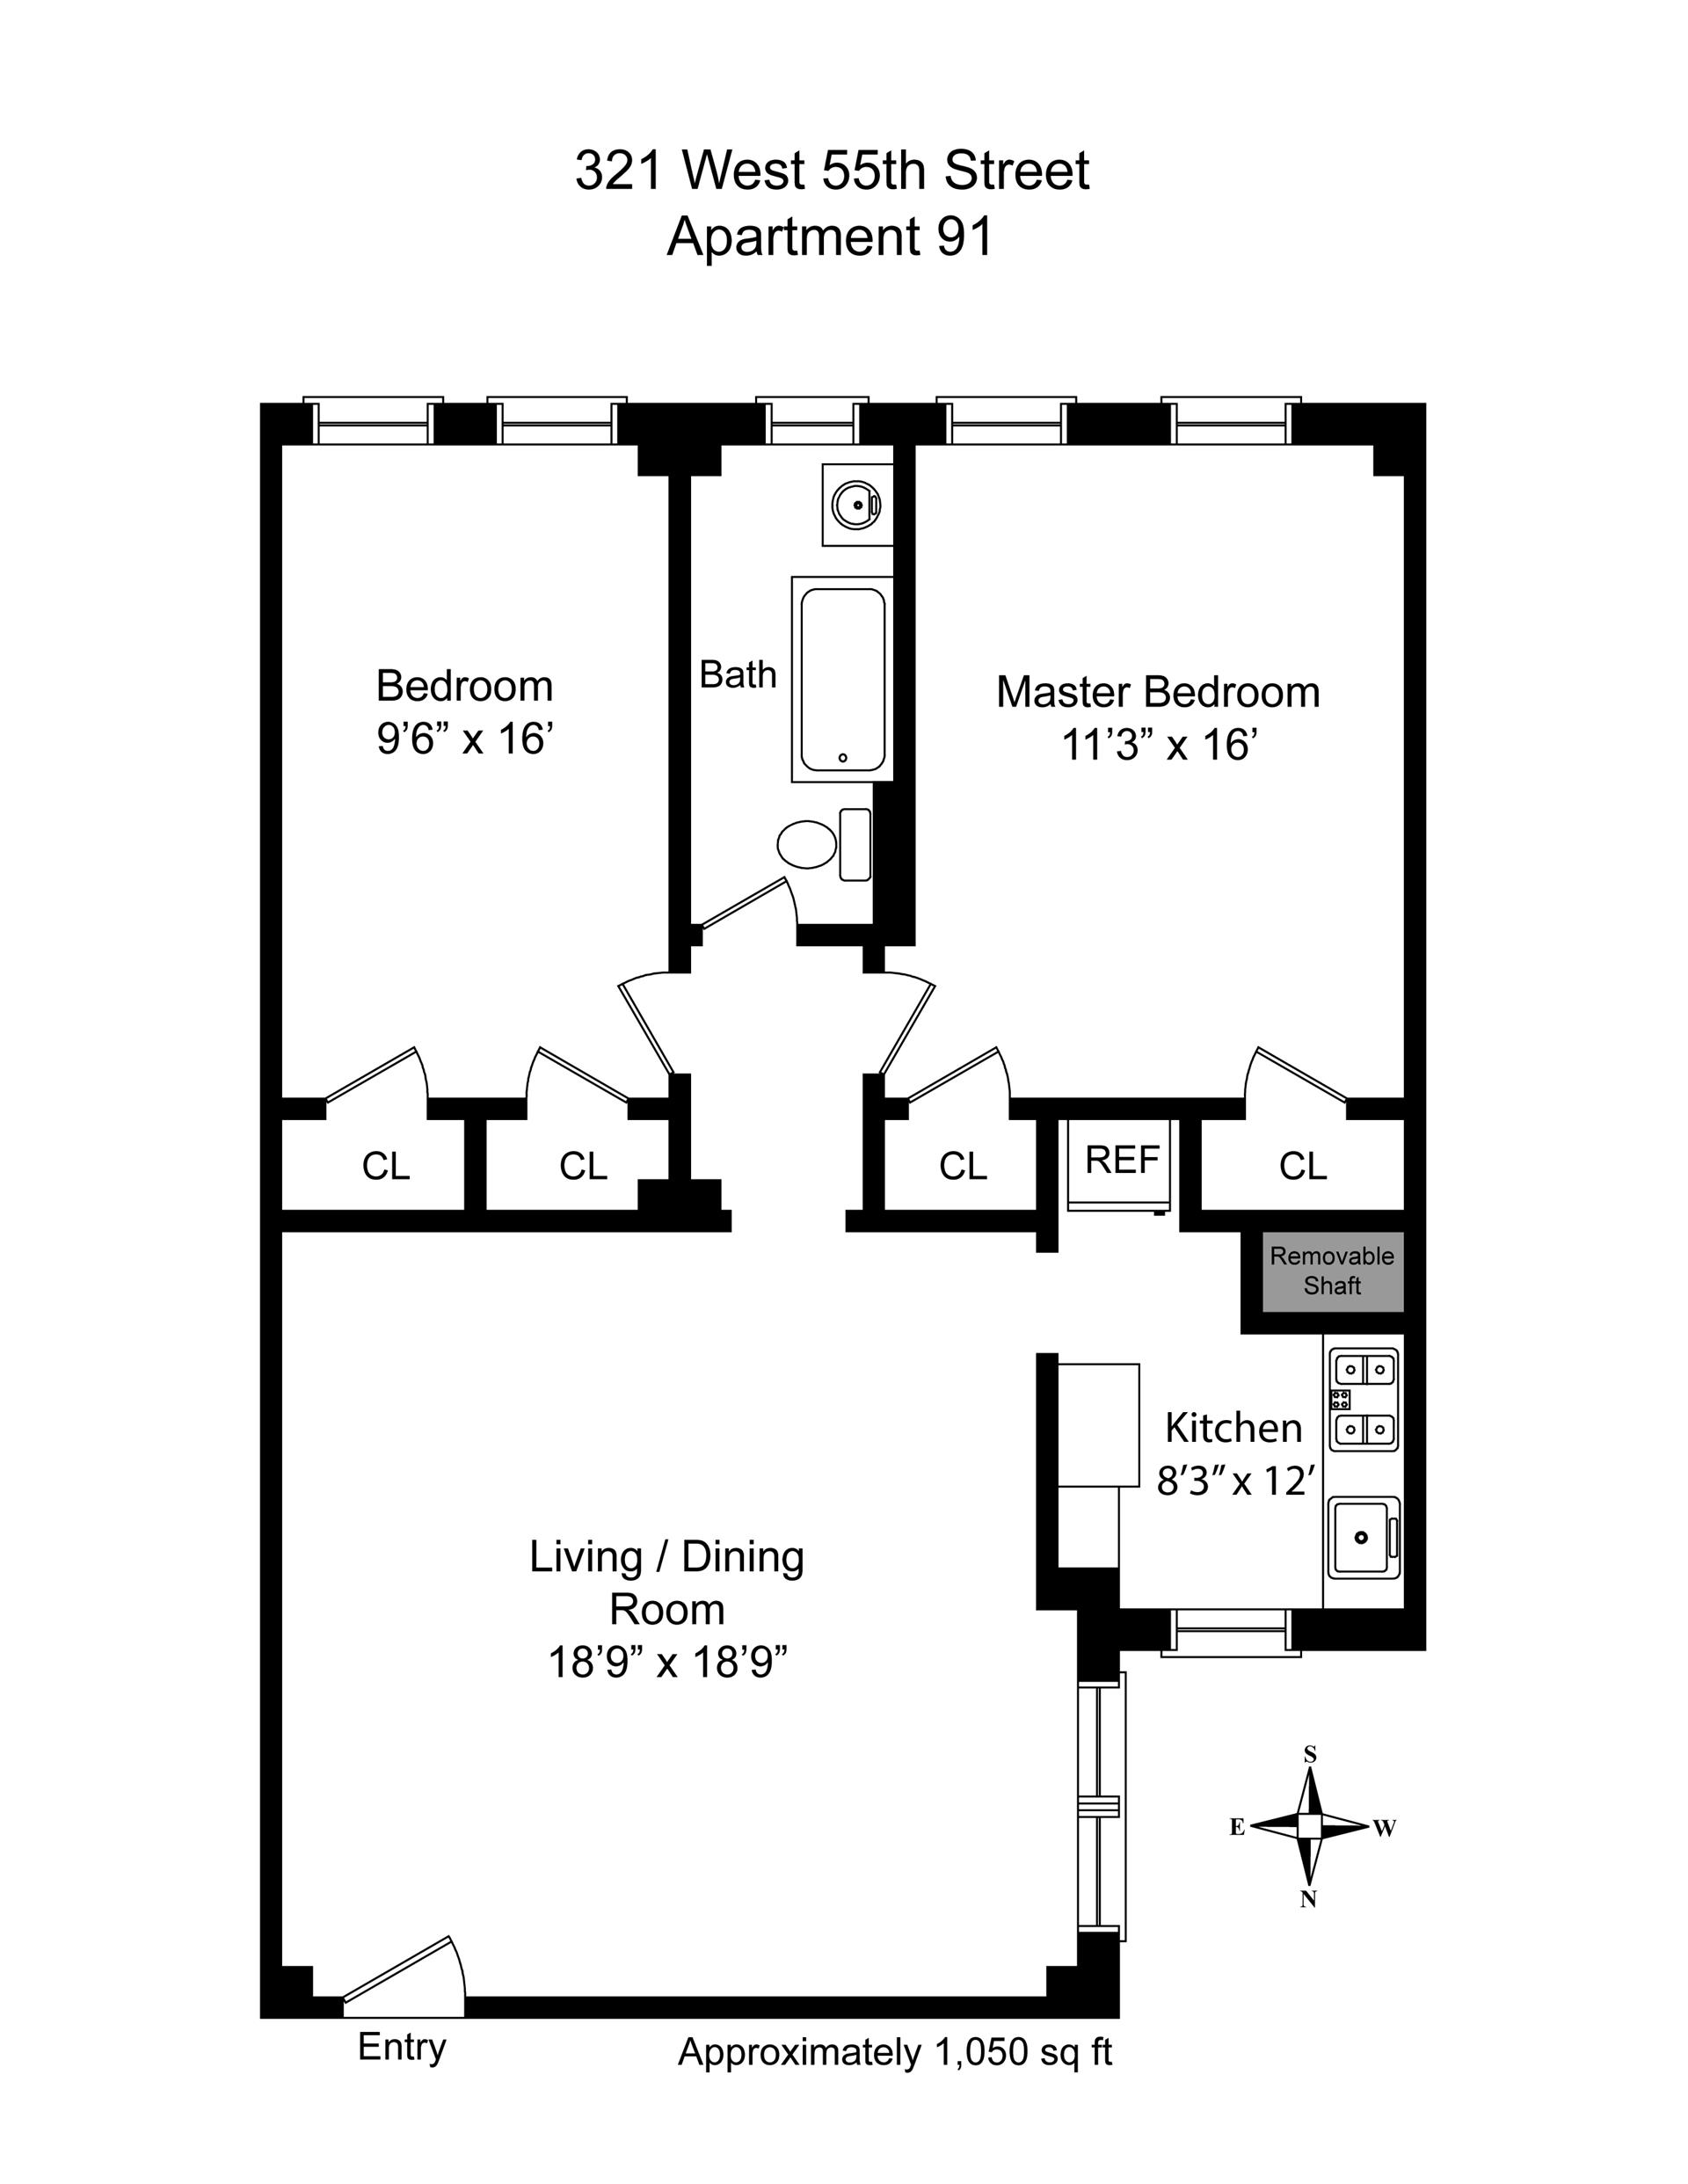 Floor plan of 321 West 55th St, 91 - Clinton, New York